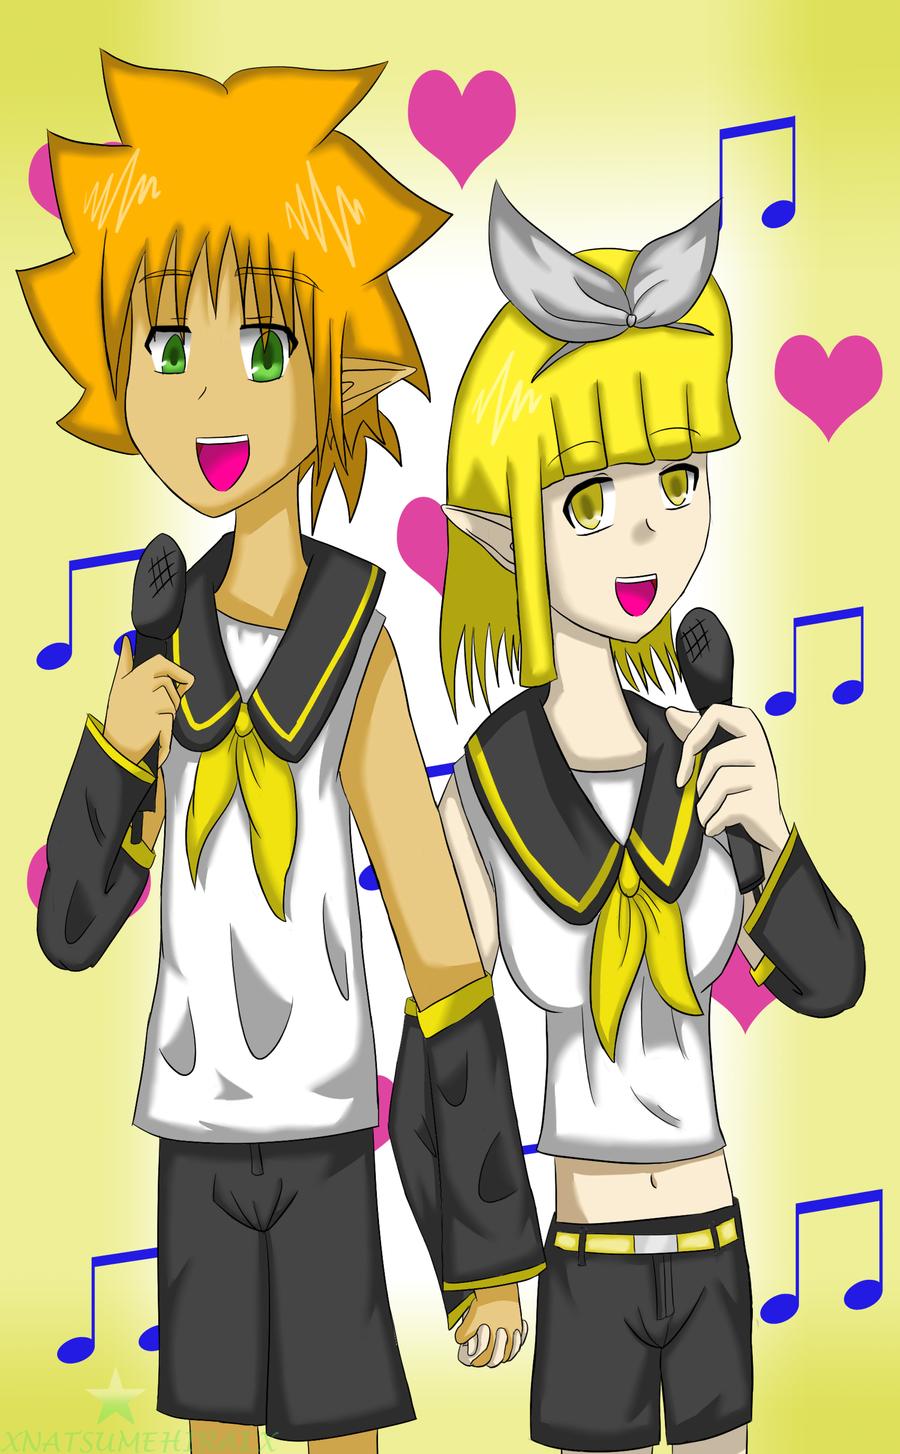 Vocaloids Ryan and Lire by NatsumeHirai